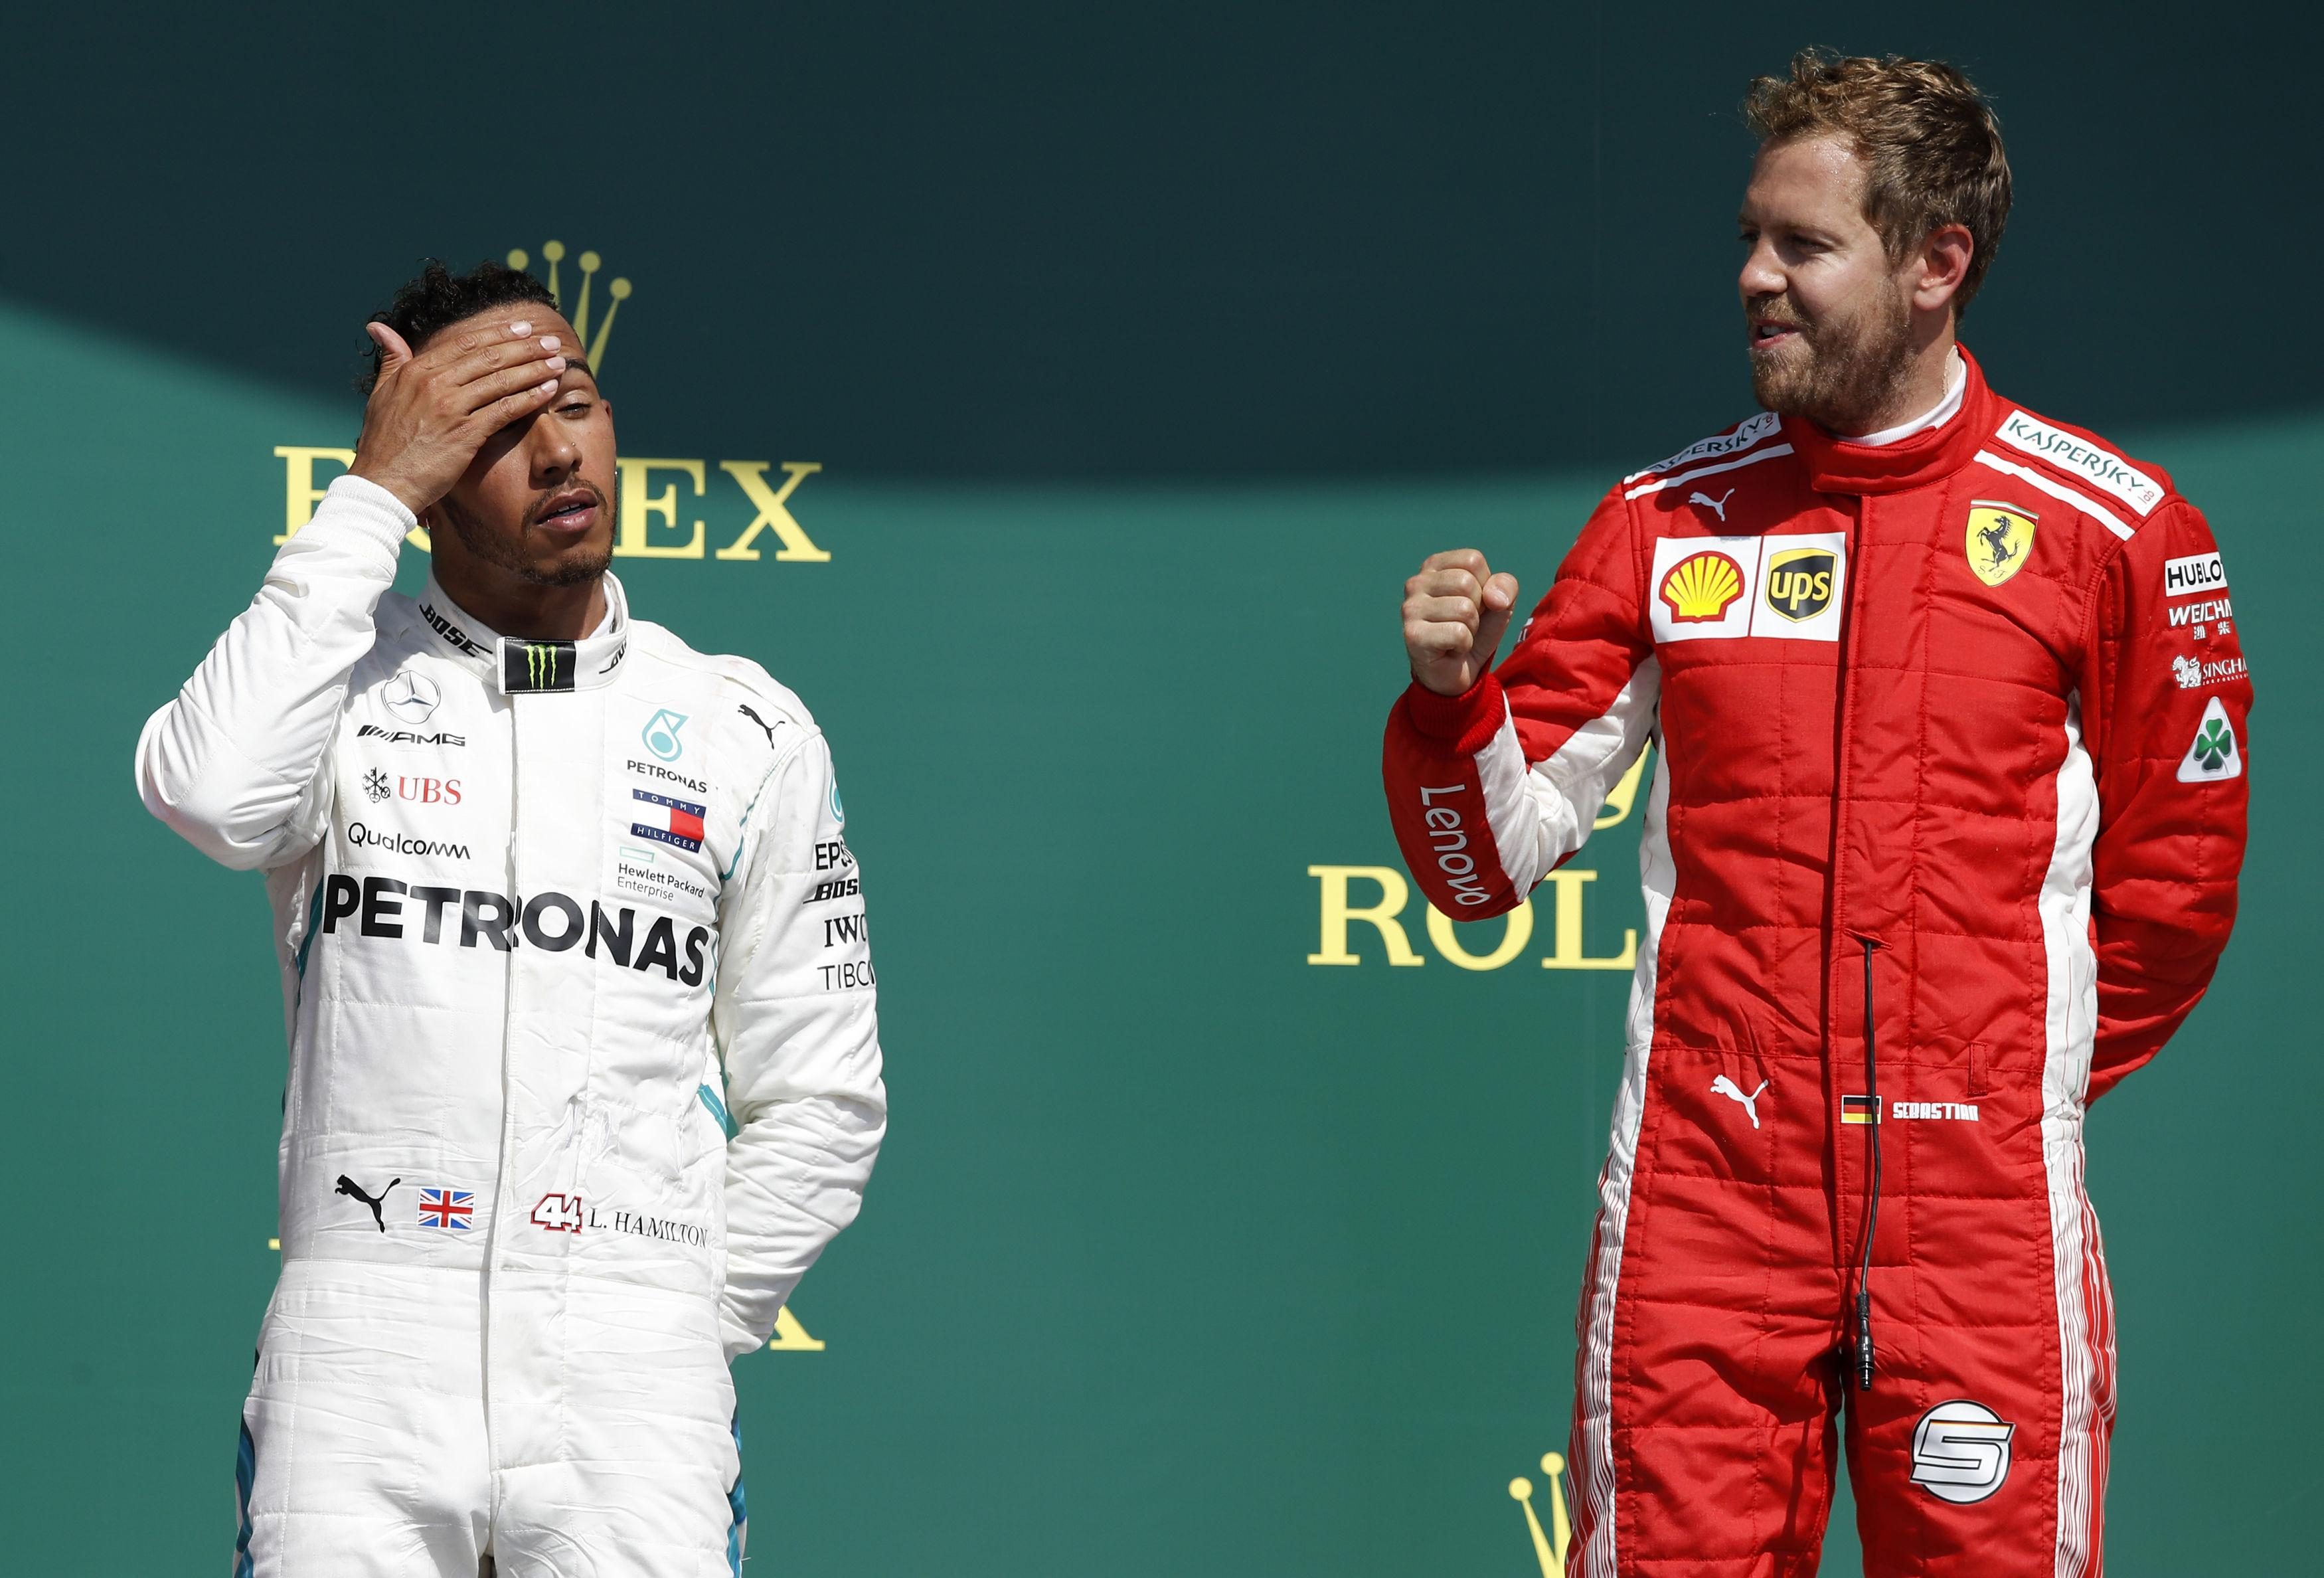 Briton Hamilton finished second behind Ferrari's Sebastian Vettel